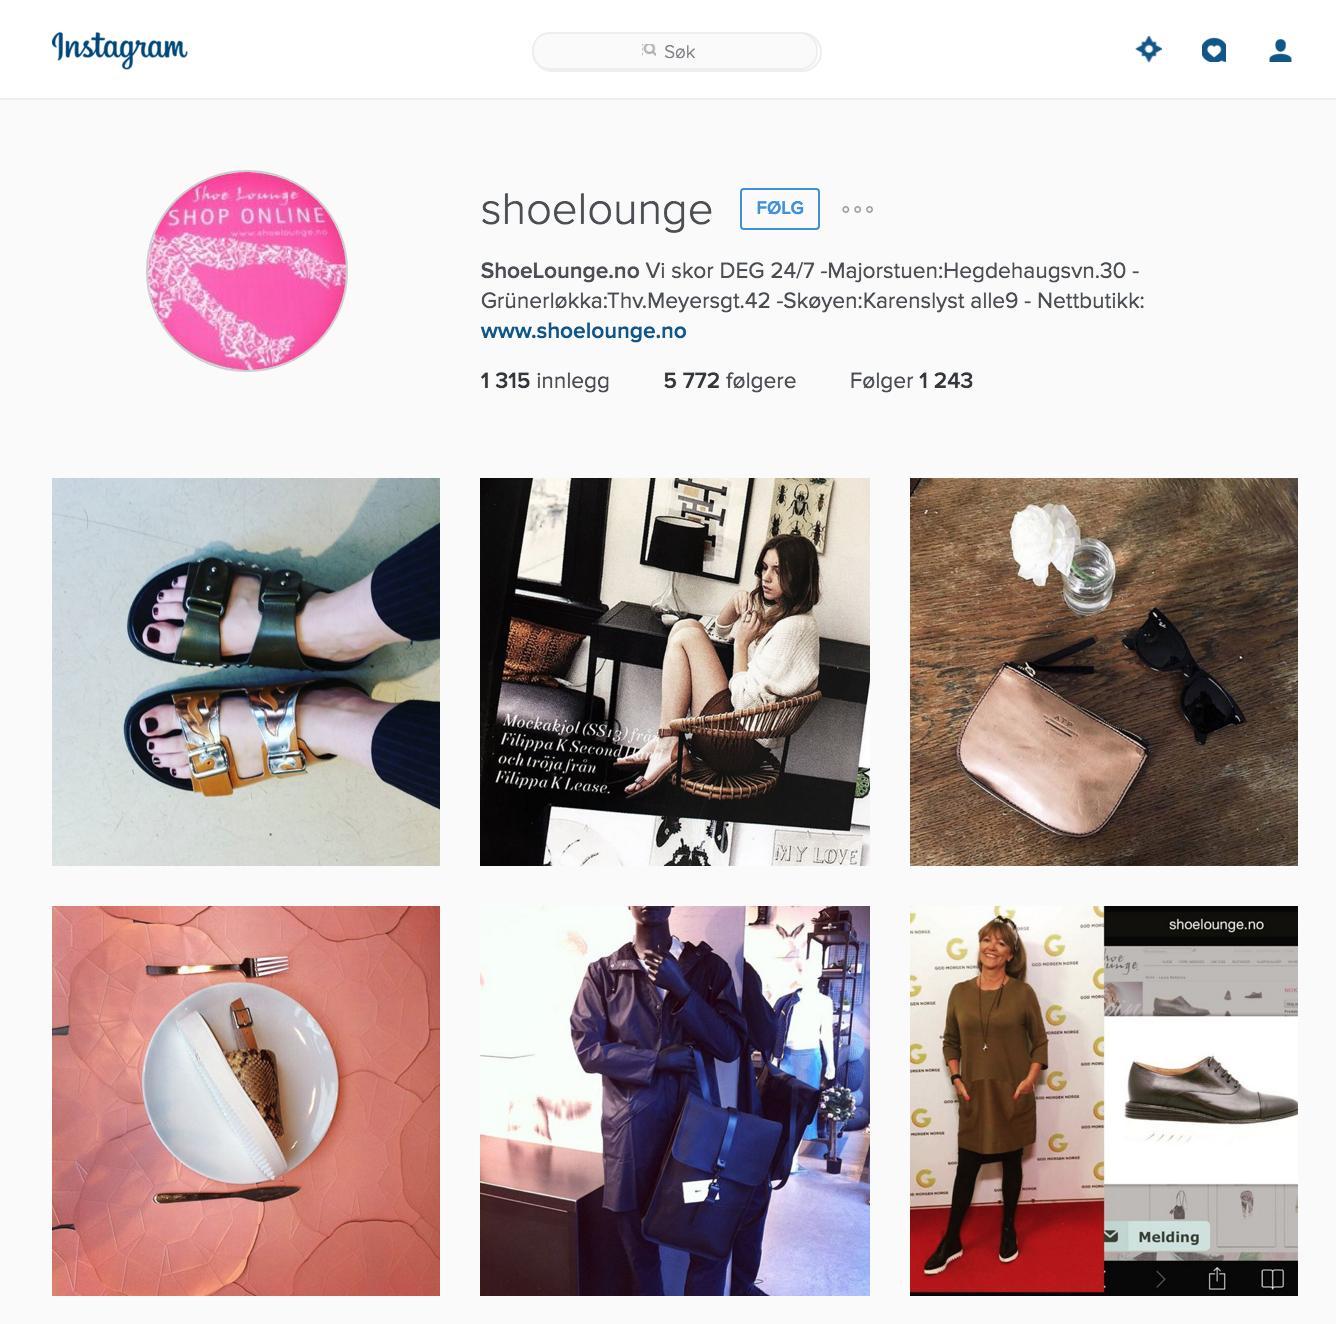 Hvordan lage flere instagram kontoer